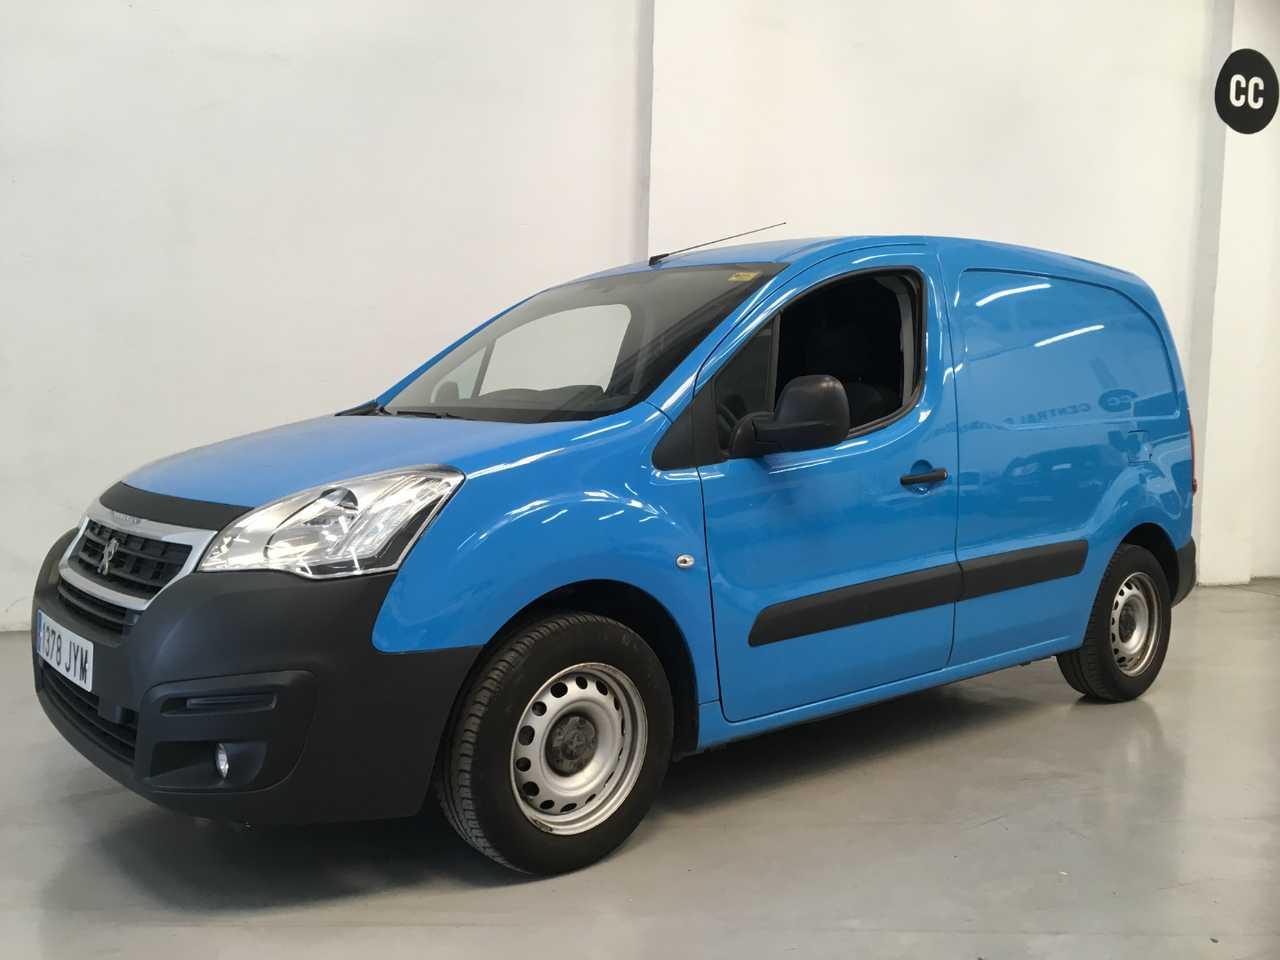 Peugeot Partner 1.6 BlueHDI 75cv  Furgon Confort Pack / Apple Car Play / pARKTRONIC   - Foto 1